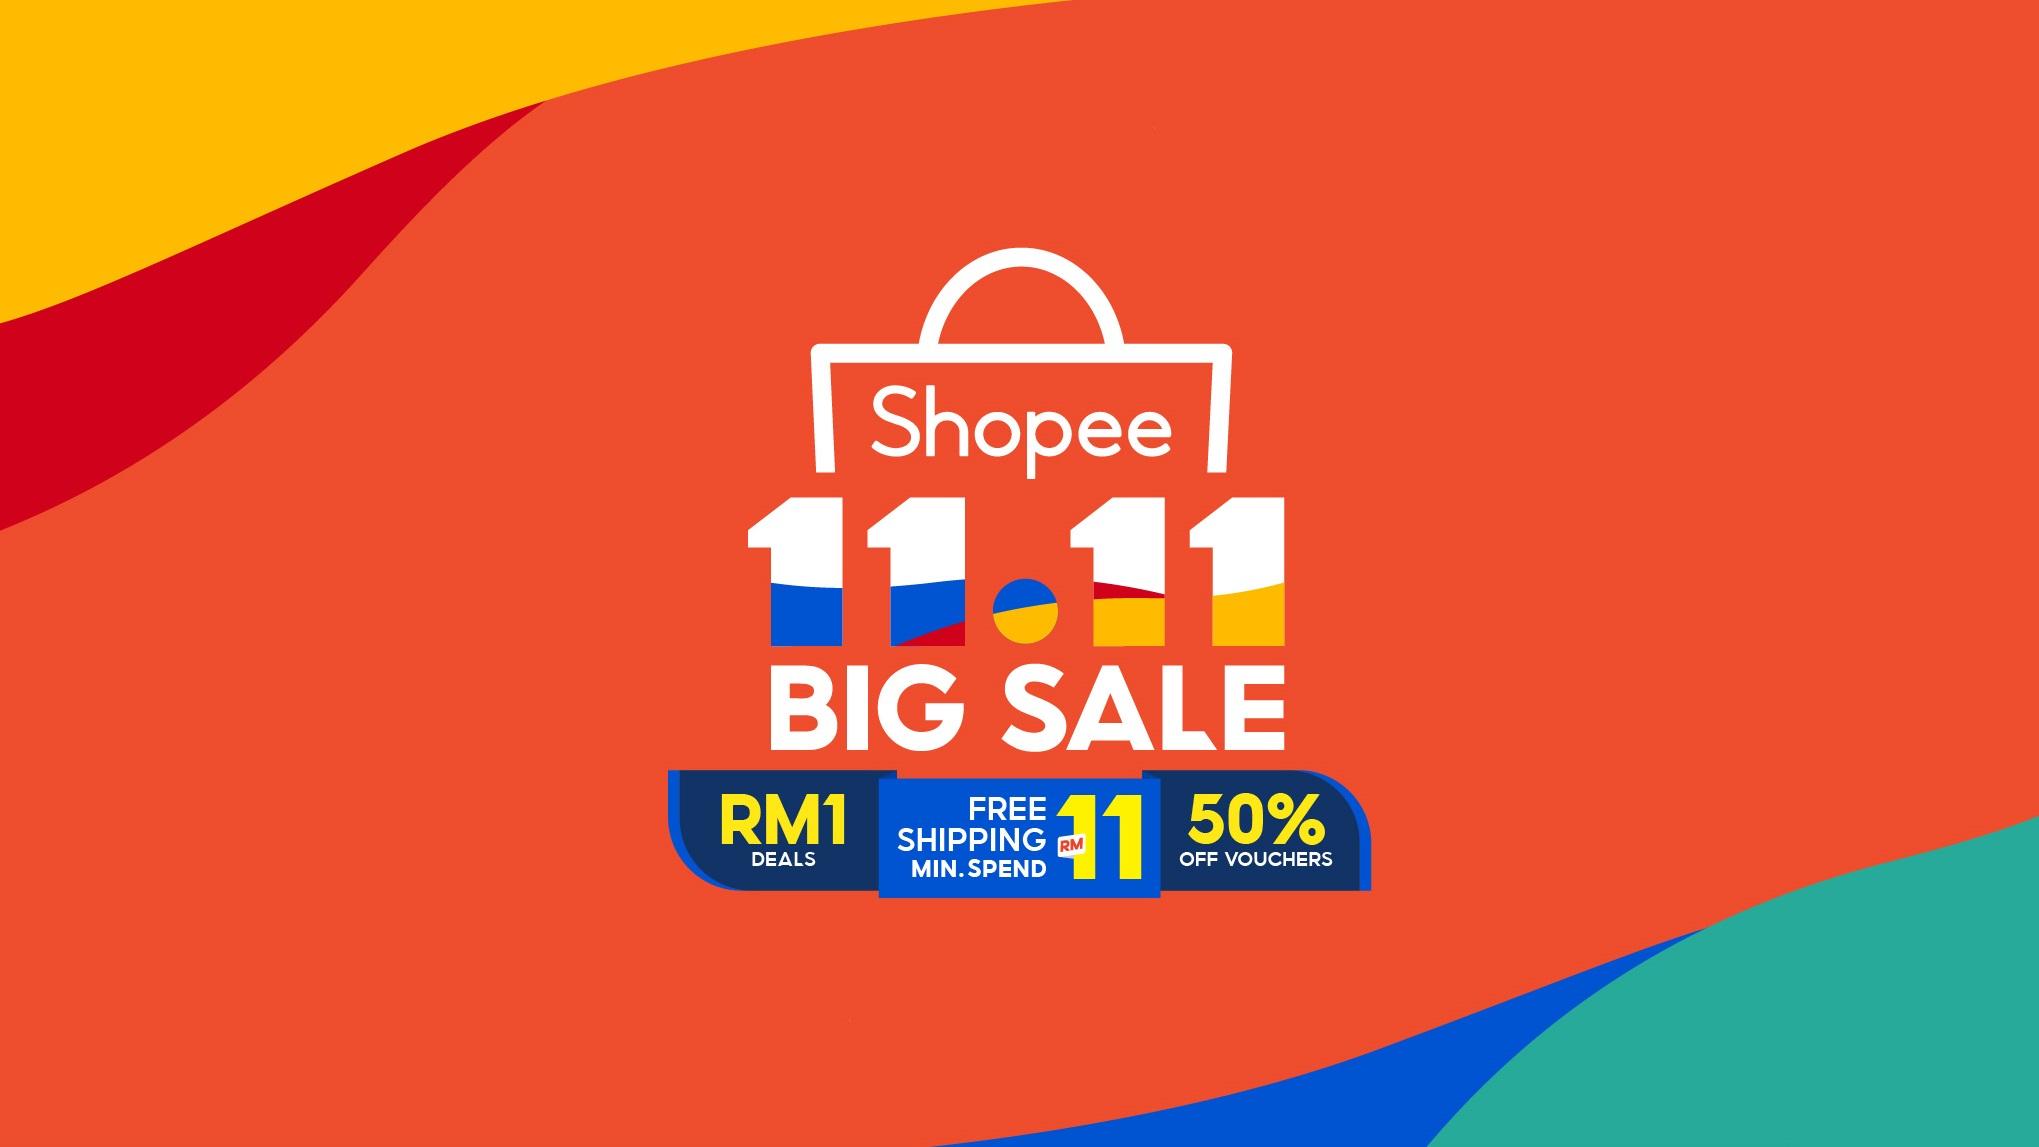 Shopee 11.11 Electronic Big Sale Deal